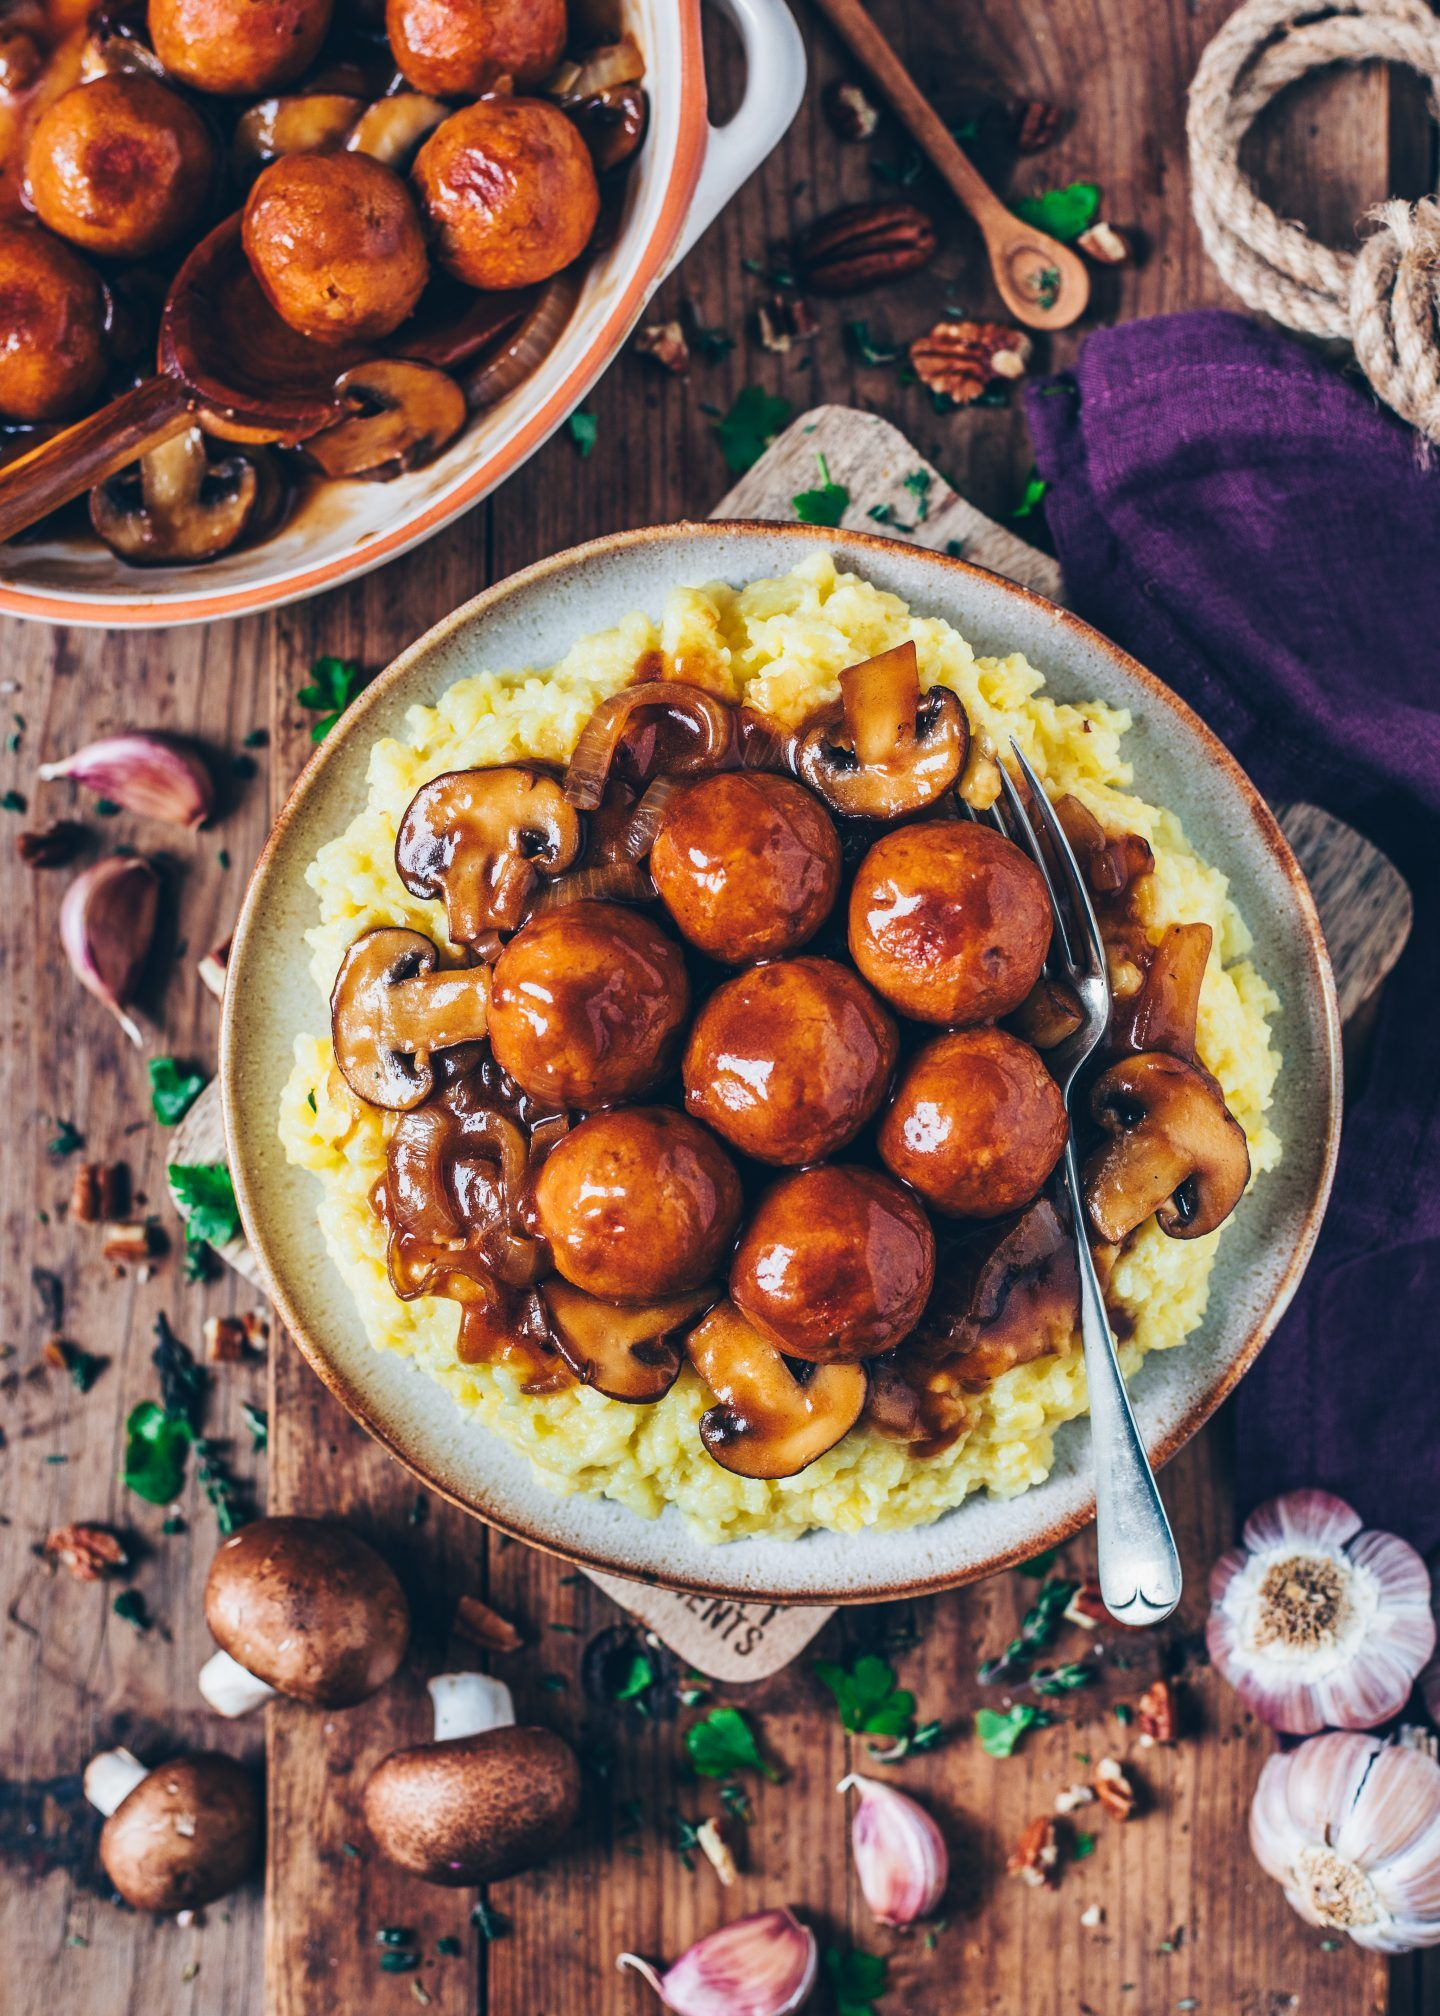 Kichererbsen-Bällchen mit Bratensoße & Kartoffelpüree (vegan) - Bianca Zapatka | Rezepte